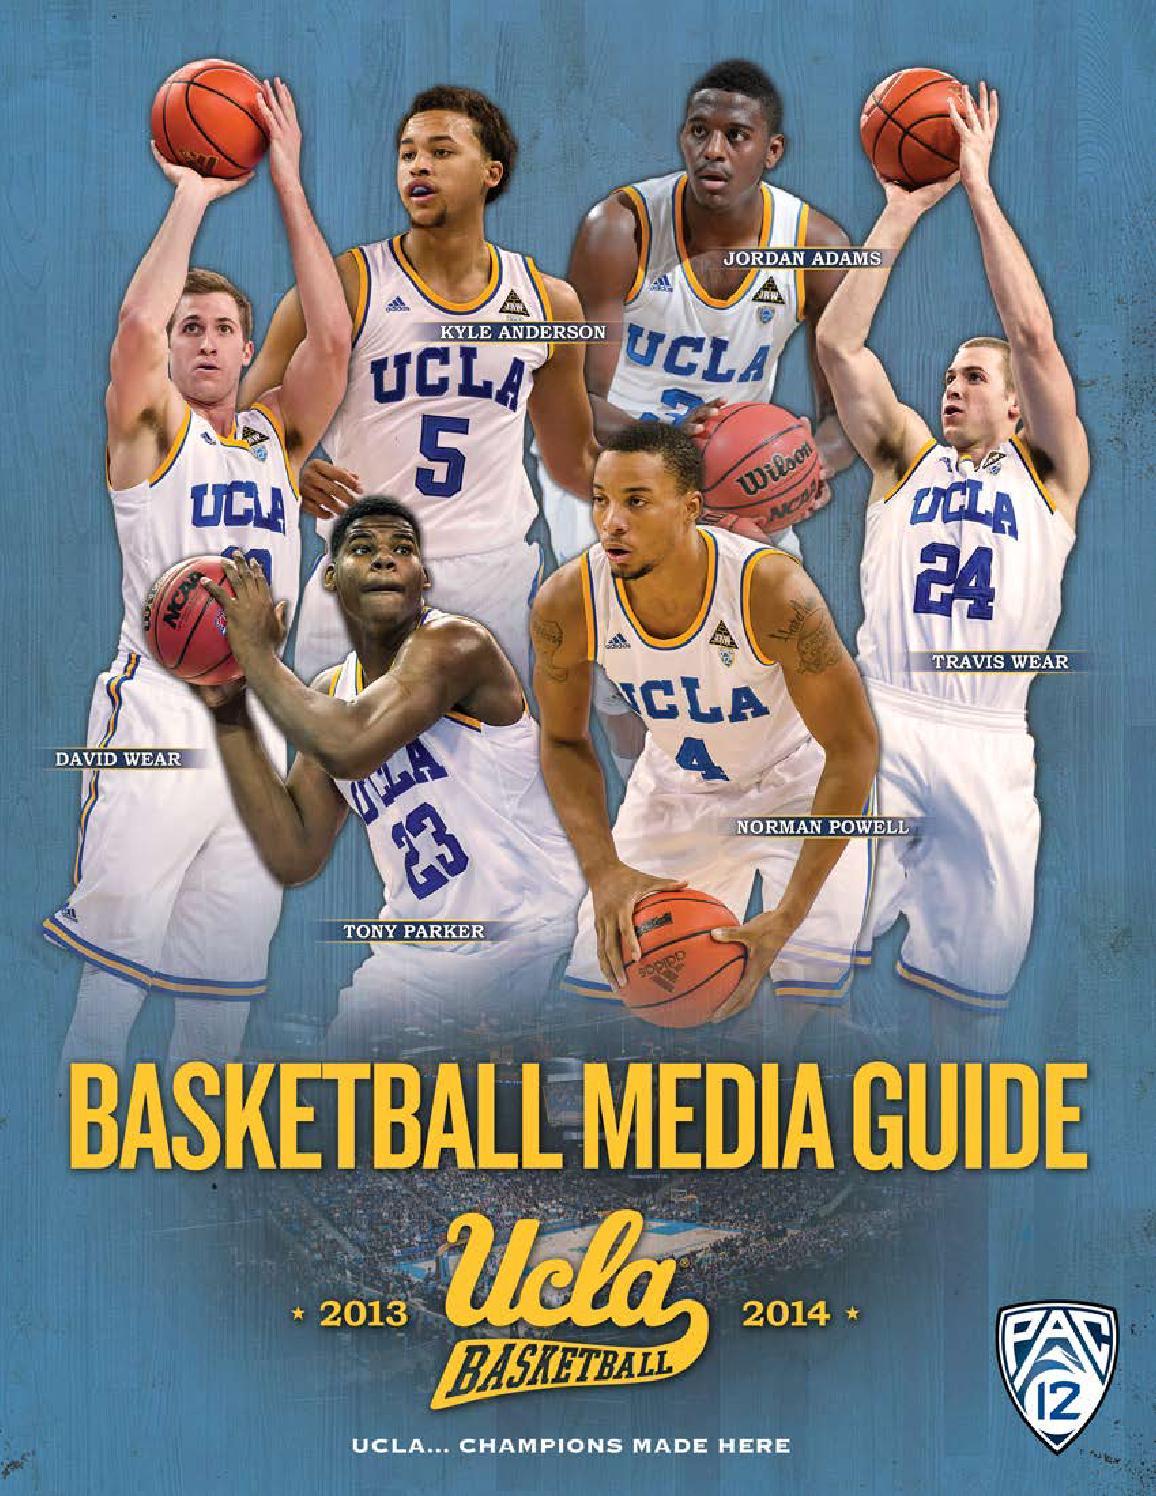 b366e6cc467d 2013-14 UCLA Men s Basketball Media Guide by UCLA Athletics - issuu